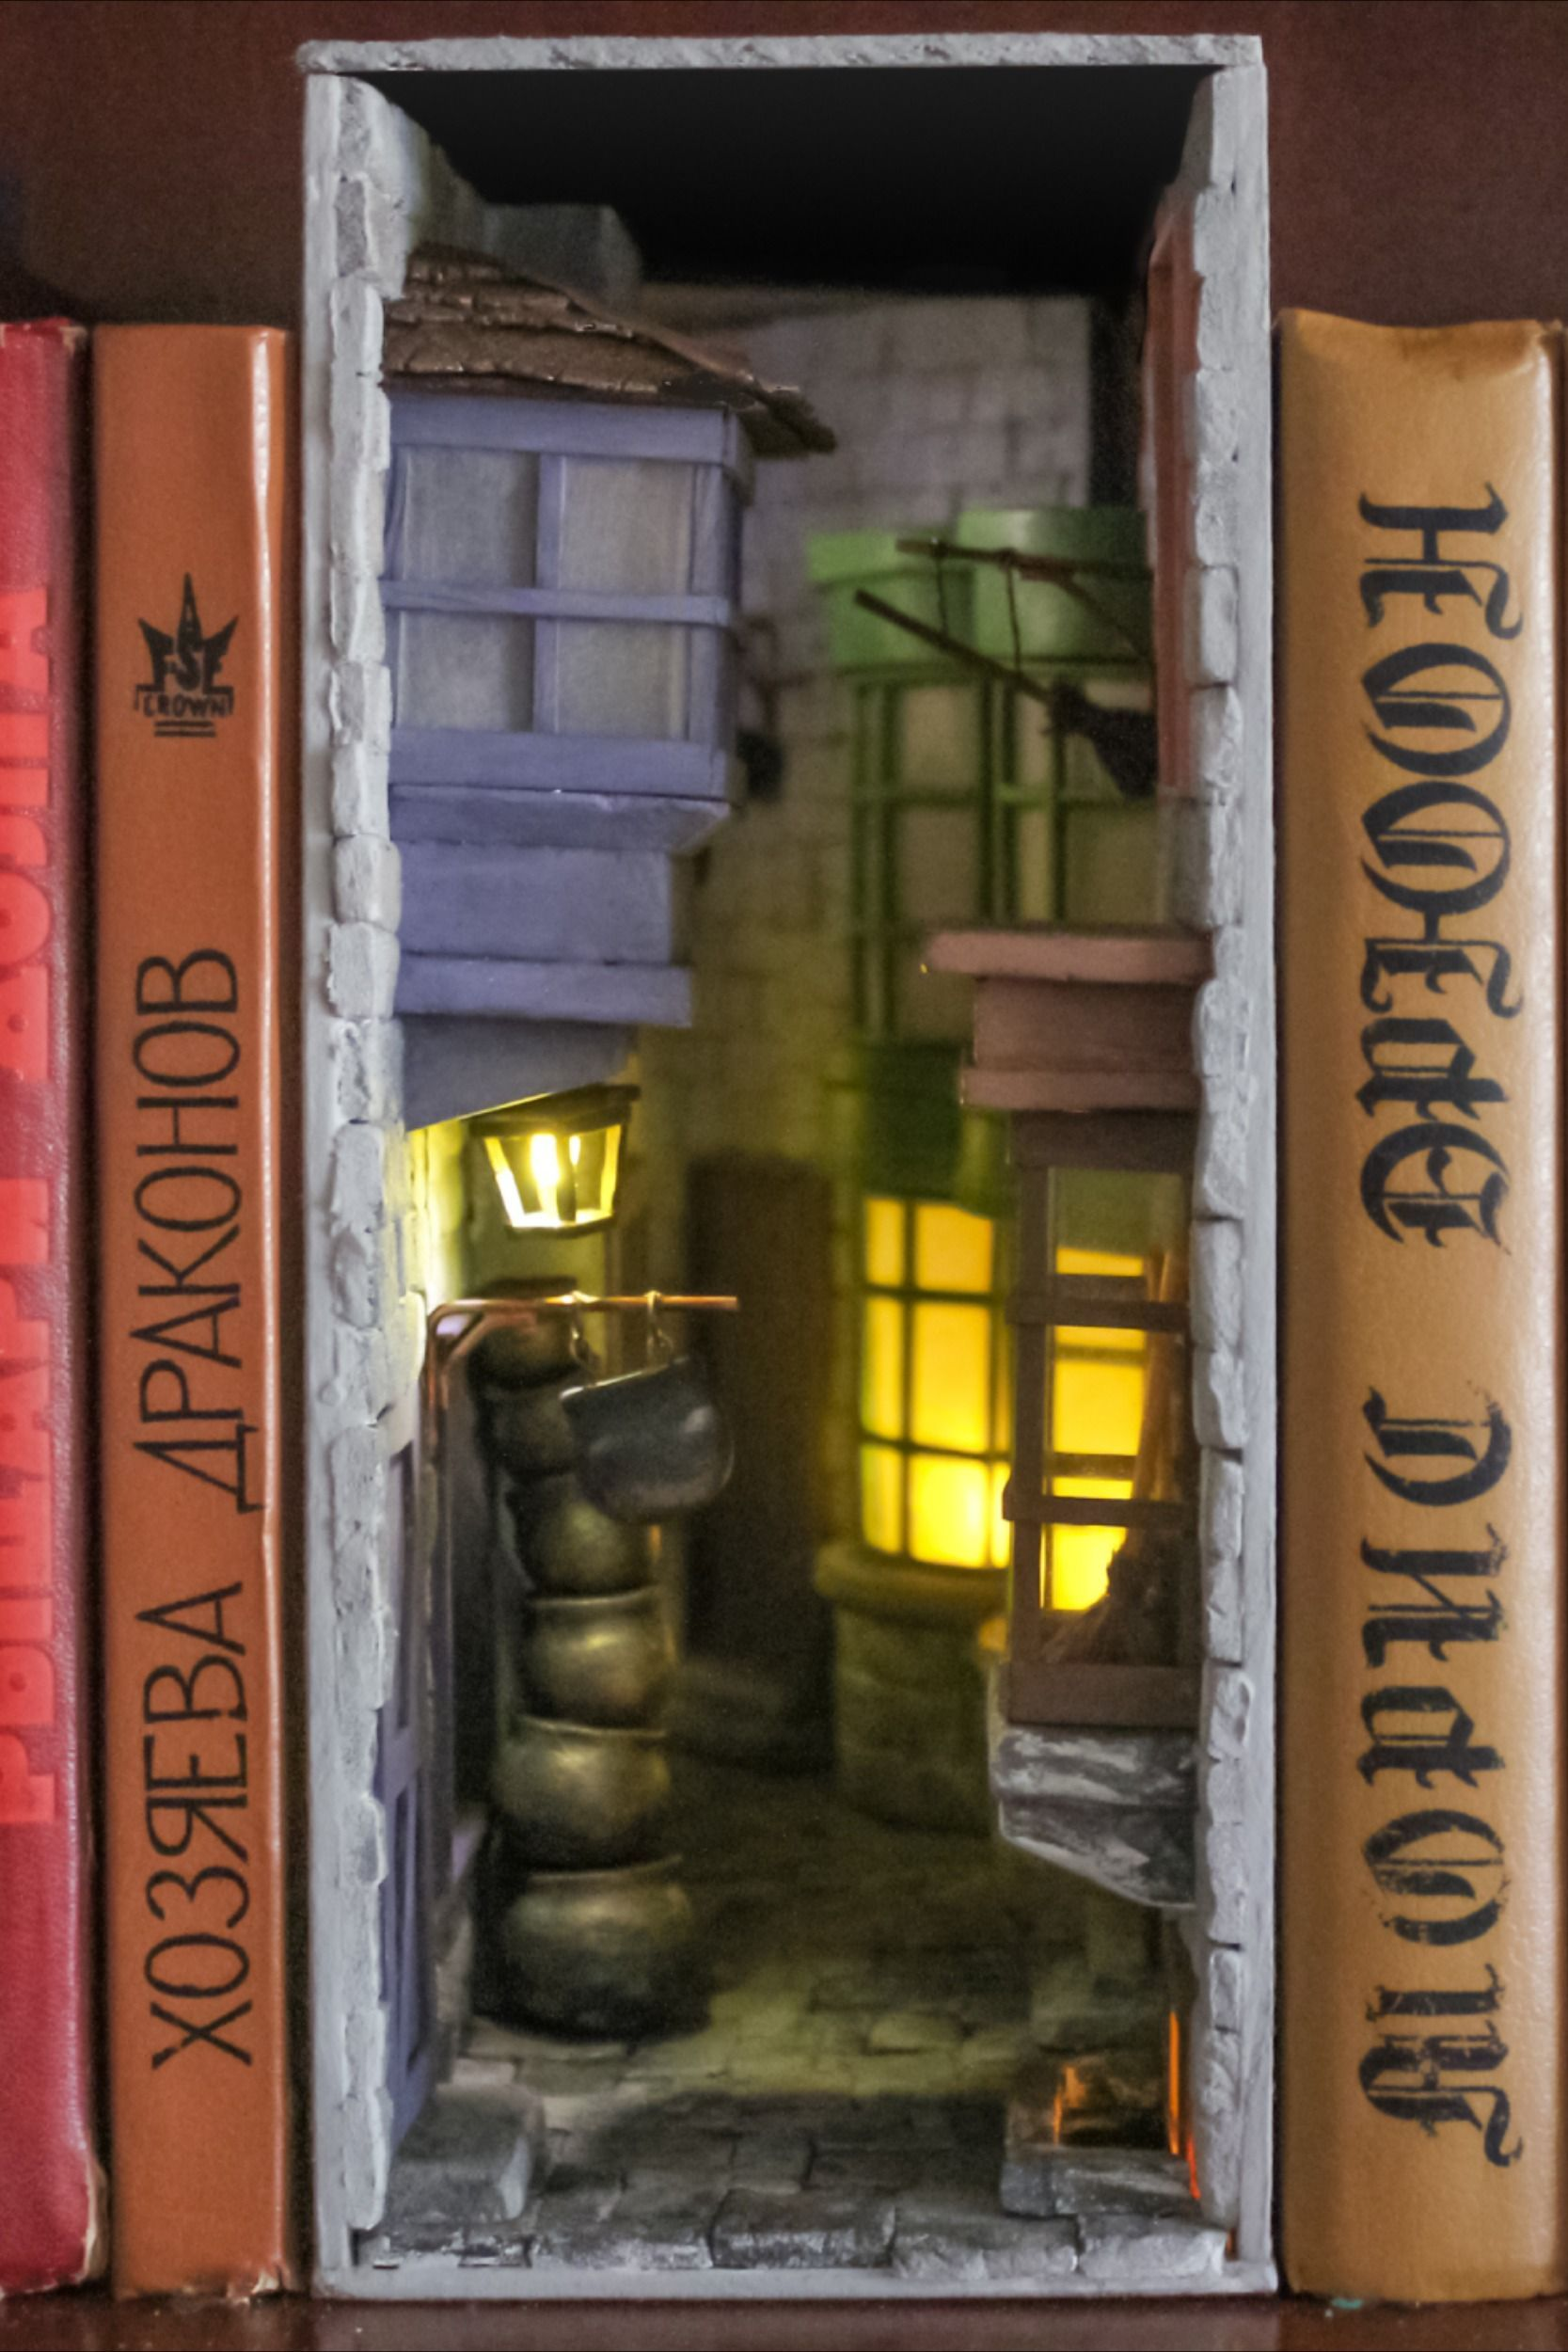 Book Nook Harry Potter A Miniature On A Bookshelf An Insert Between Books With Lighting Add Some Magic T In 2020 Book Nooks Harry Potter Harry Potter Diagon Alley